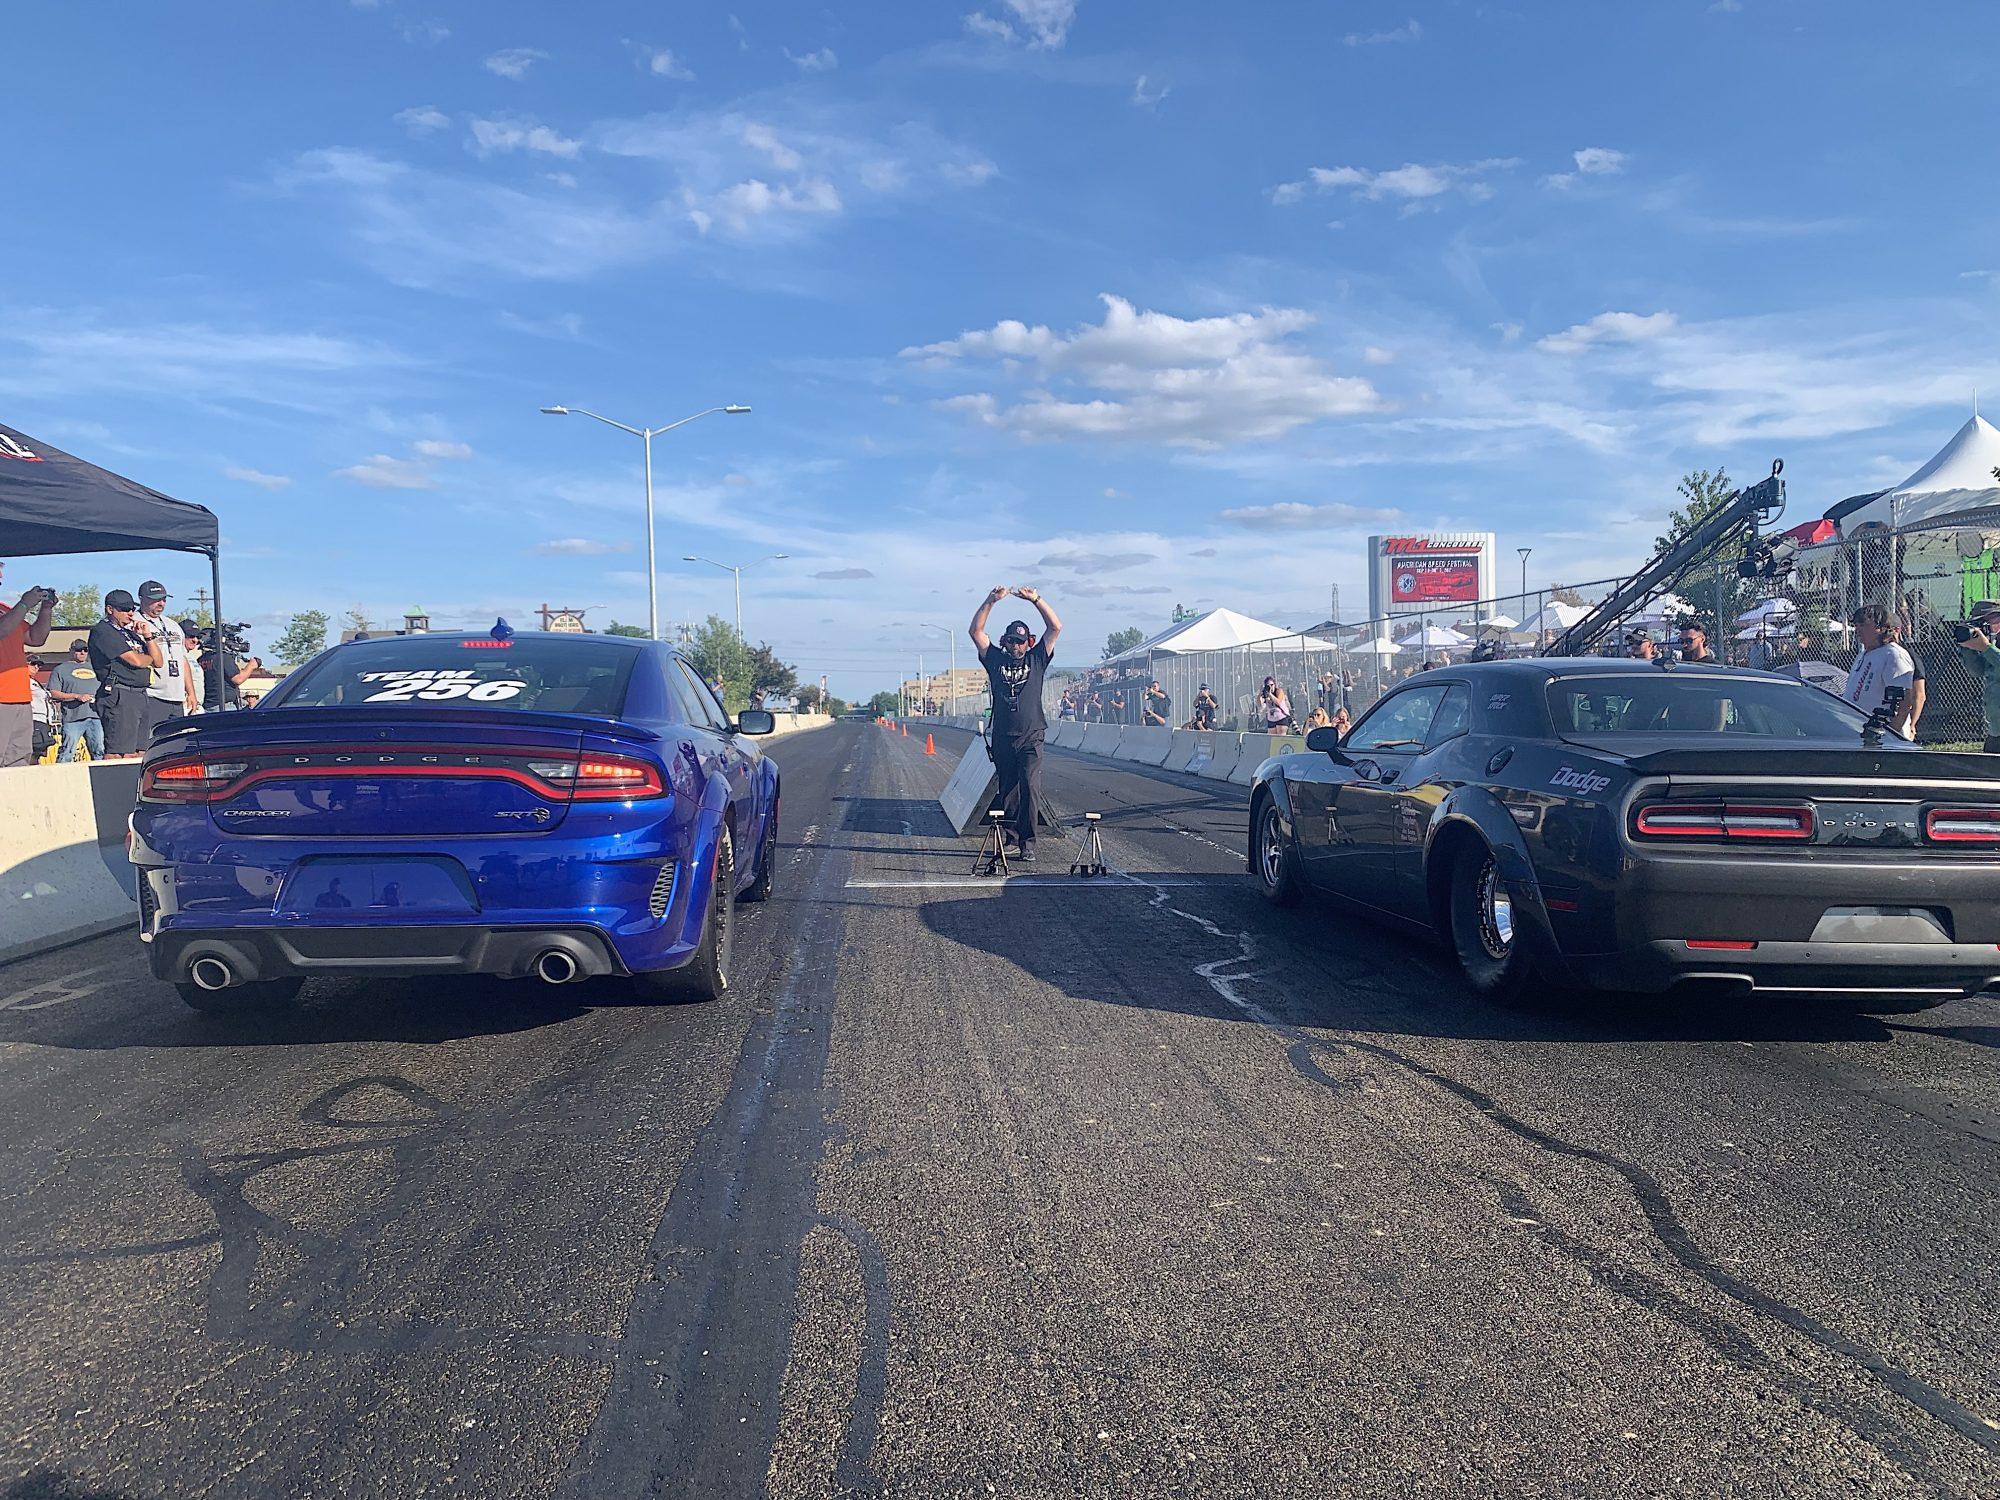 Two cars drag racing